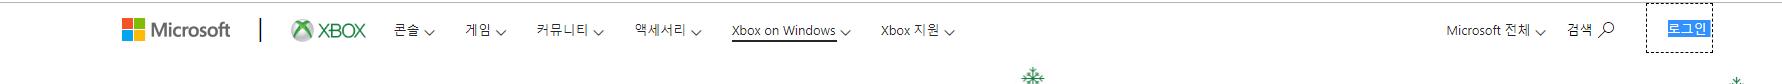 xbox 사이트에서 로그인 버튼을 눌러도 아무런 반응이 없습니다.[mod ... [IMG]